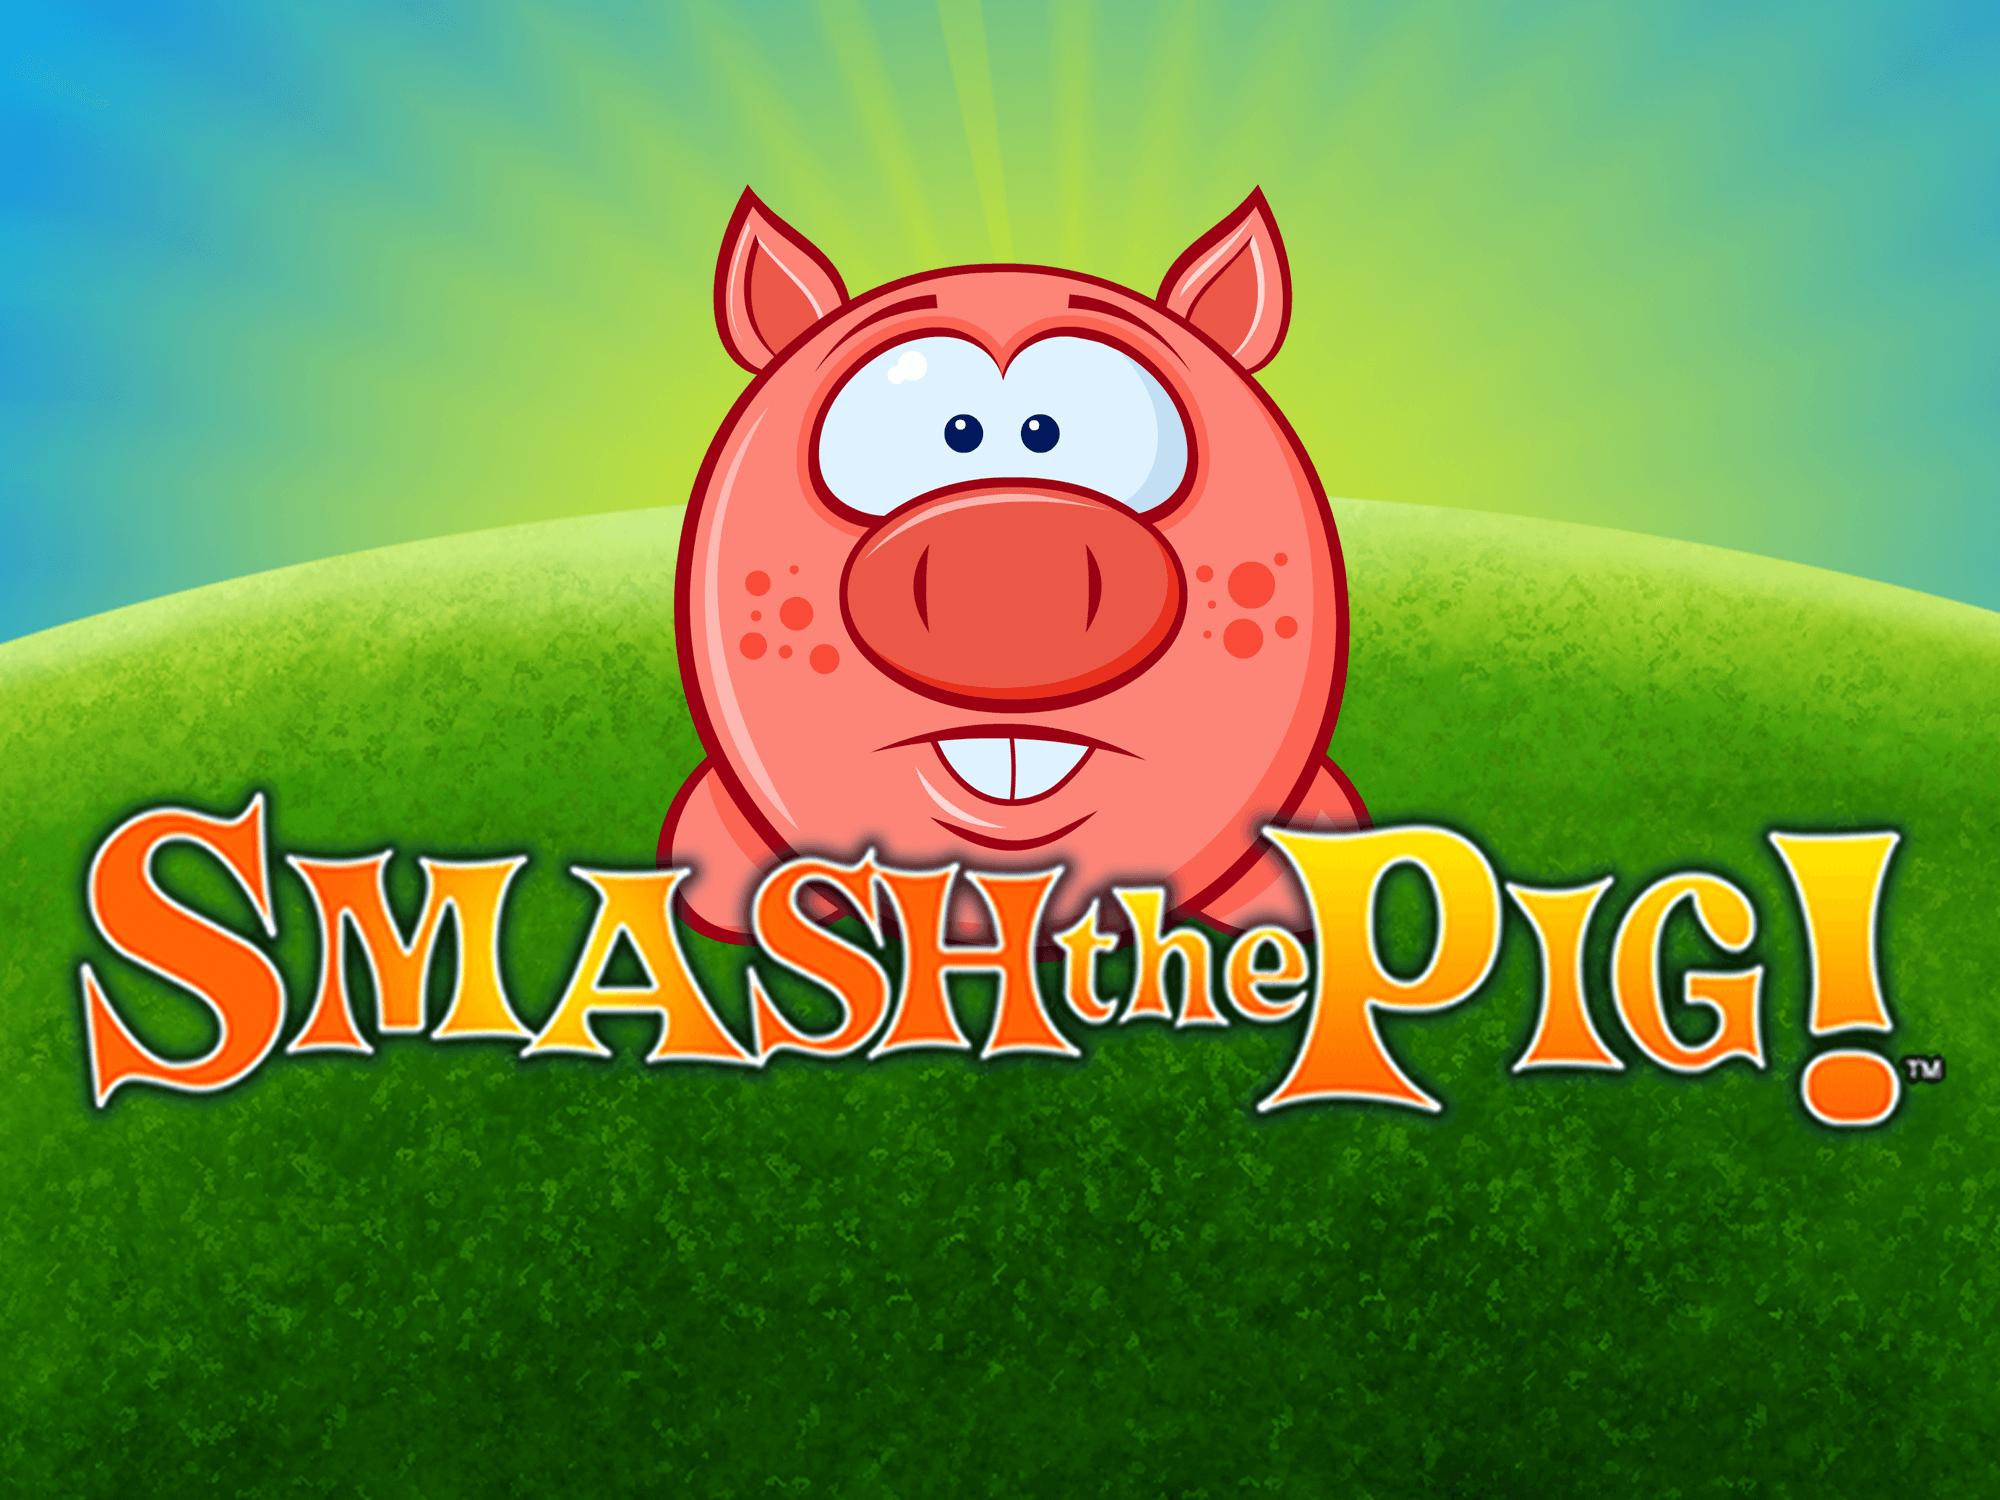 Smash The Pig Slot Machine